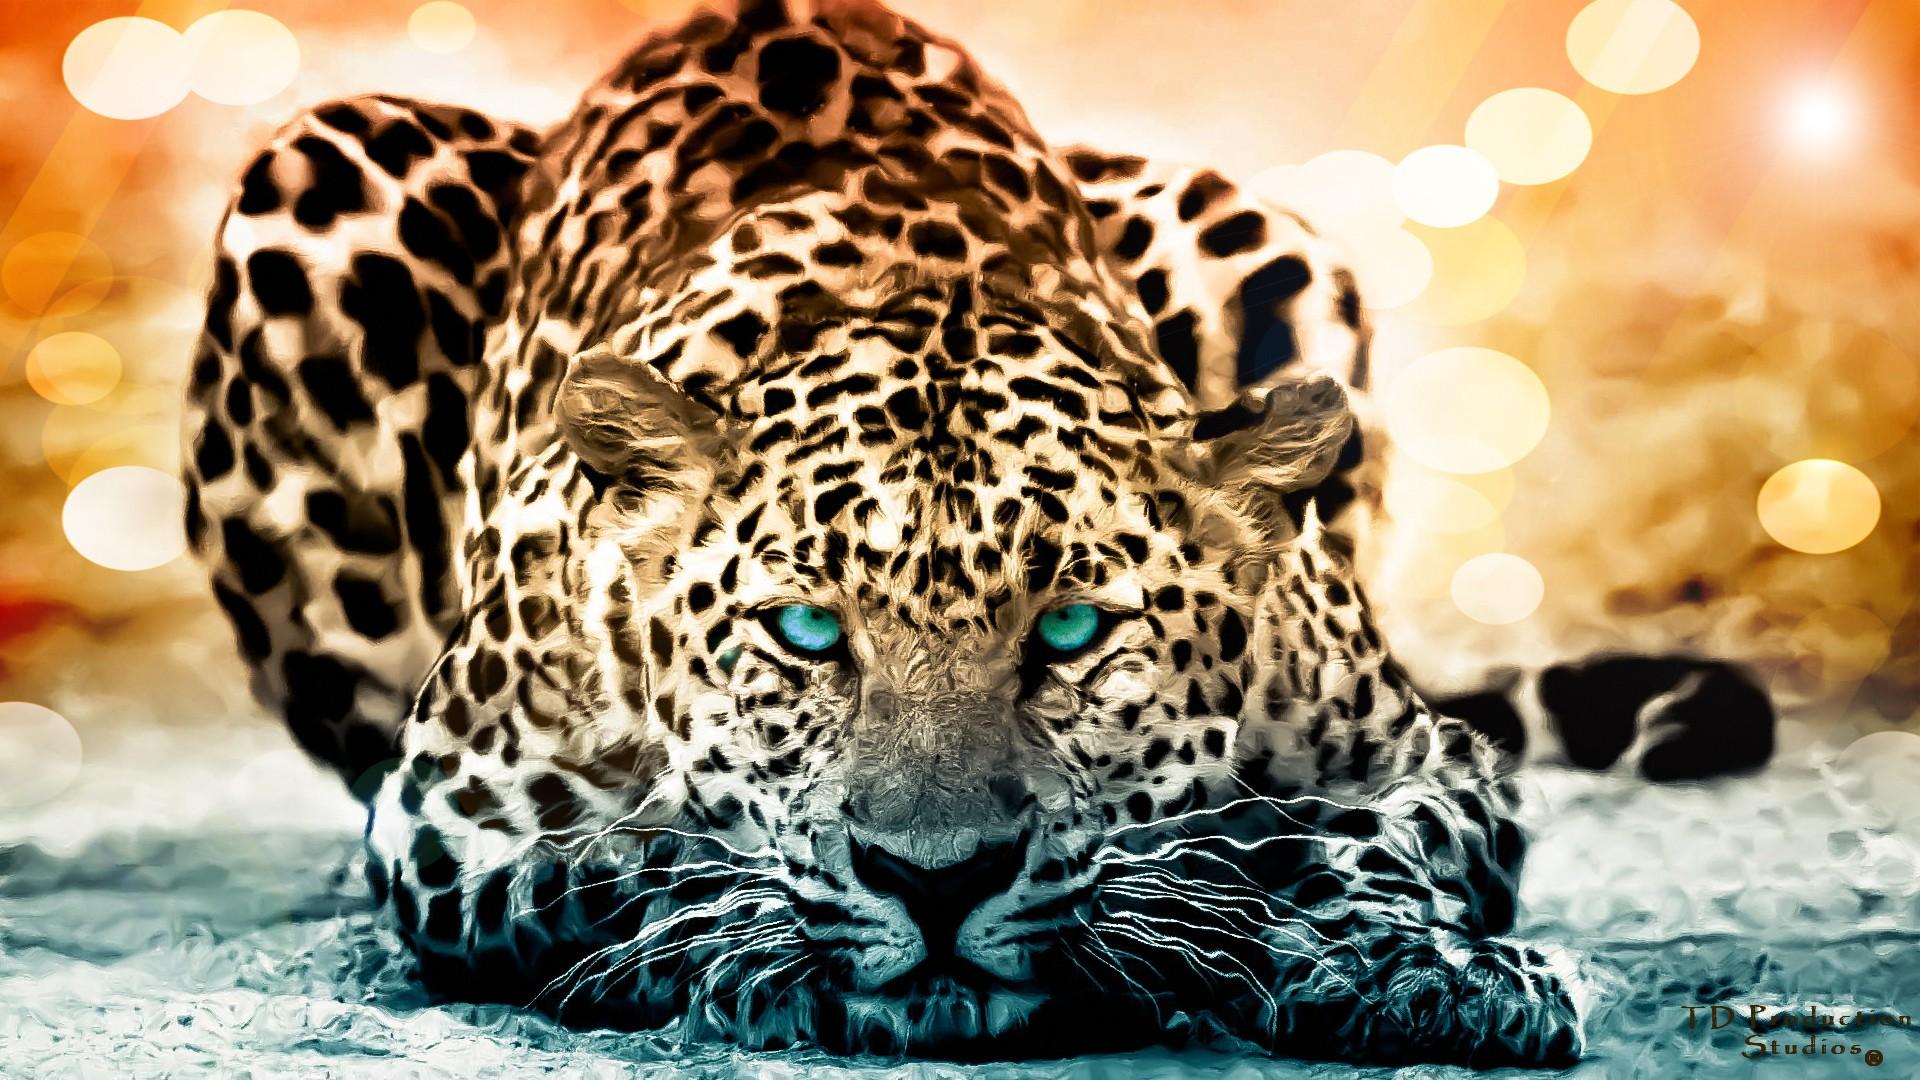 Best Jaguar Wallpaper